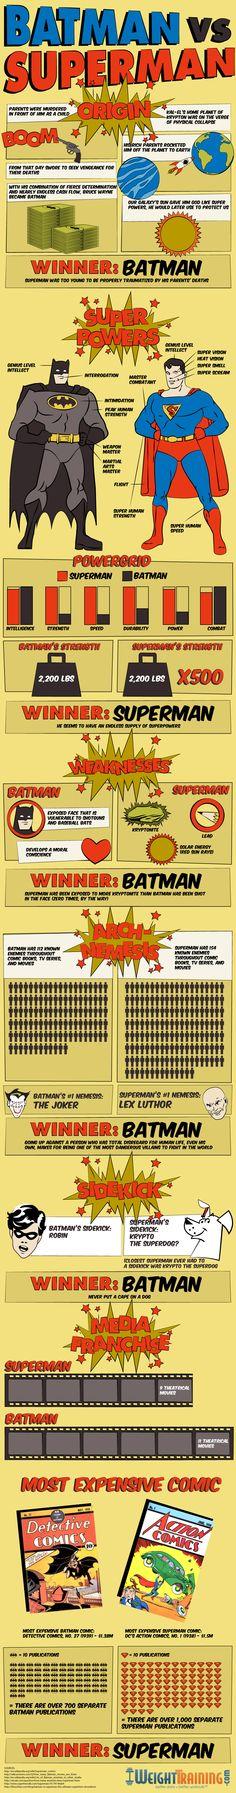 Batman vs. Superman....who wins the weight training battle?